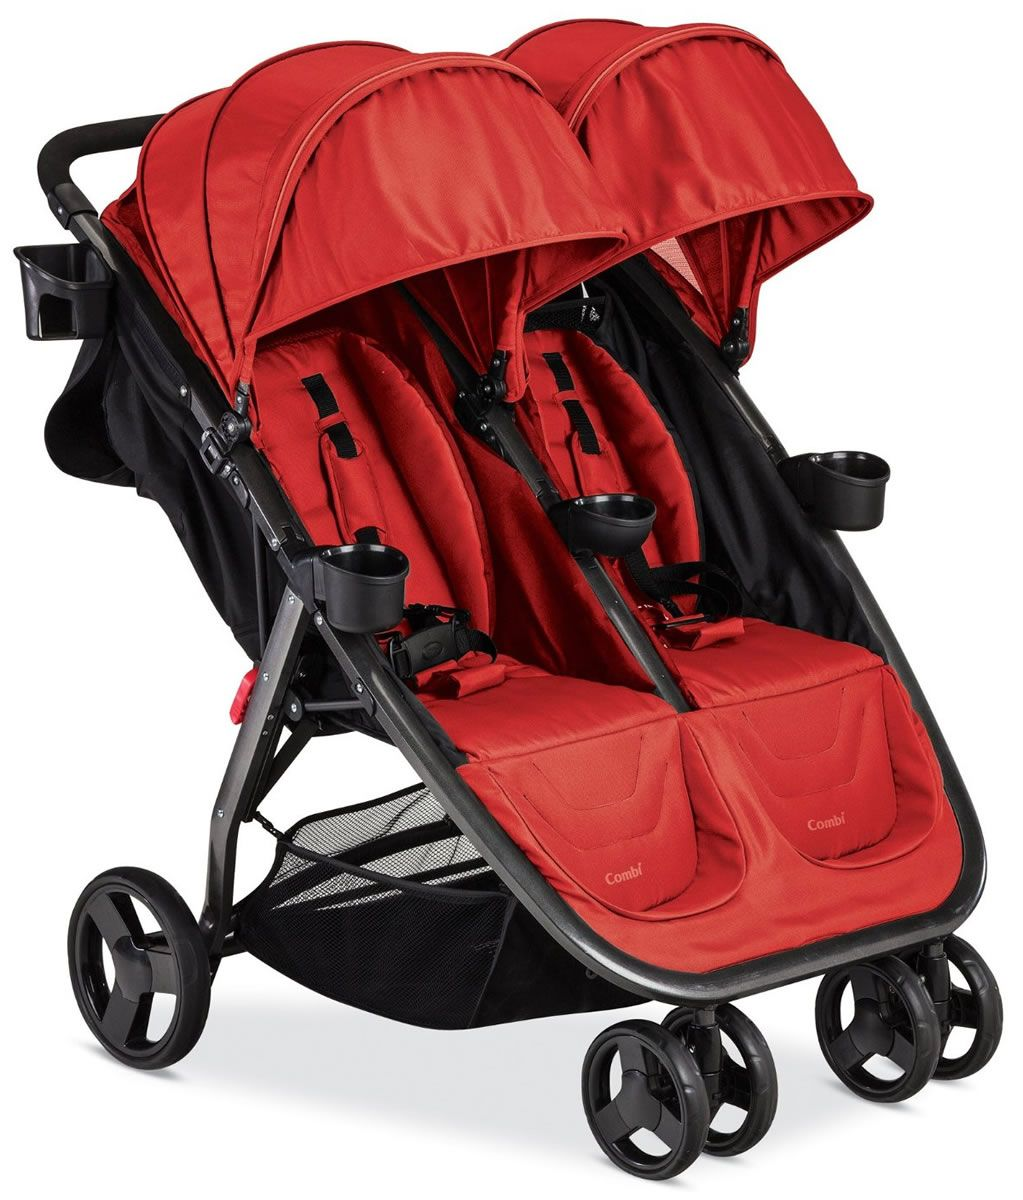 Combi Fold N Go Double Stroller Salsa Double stroller